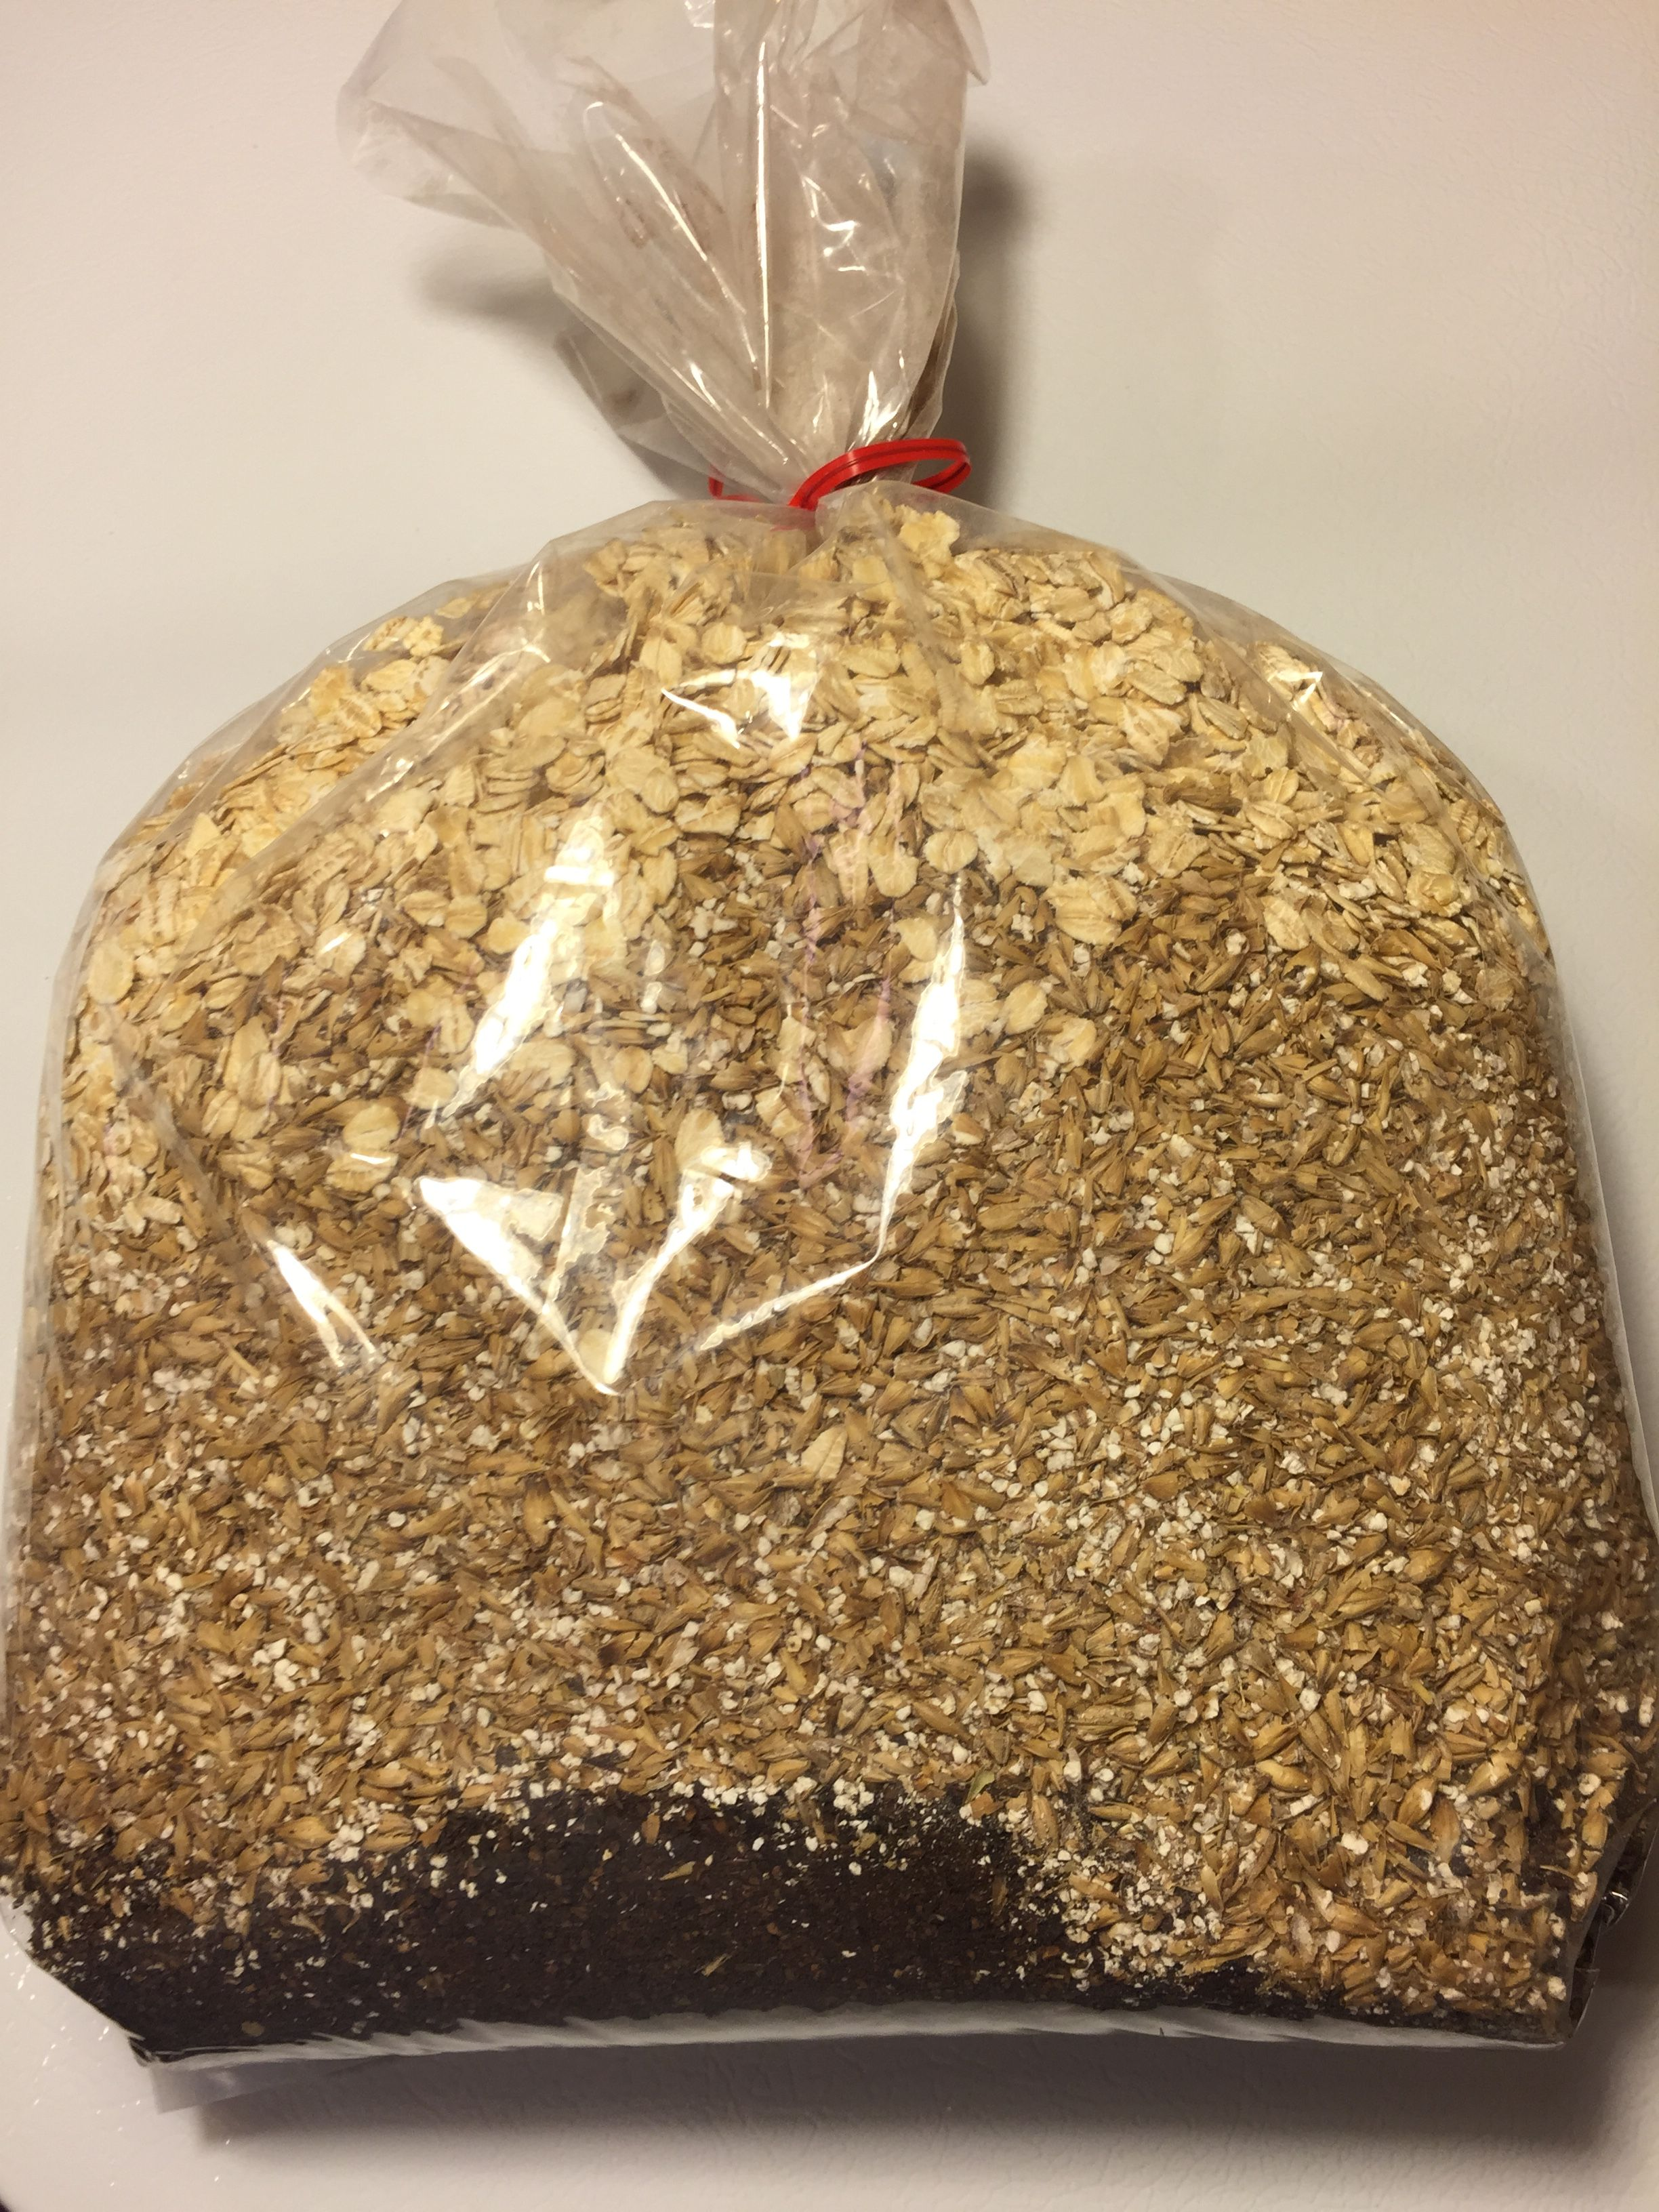 Ritebrew Oatmeal Stout Partial Mash